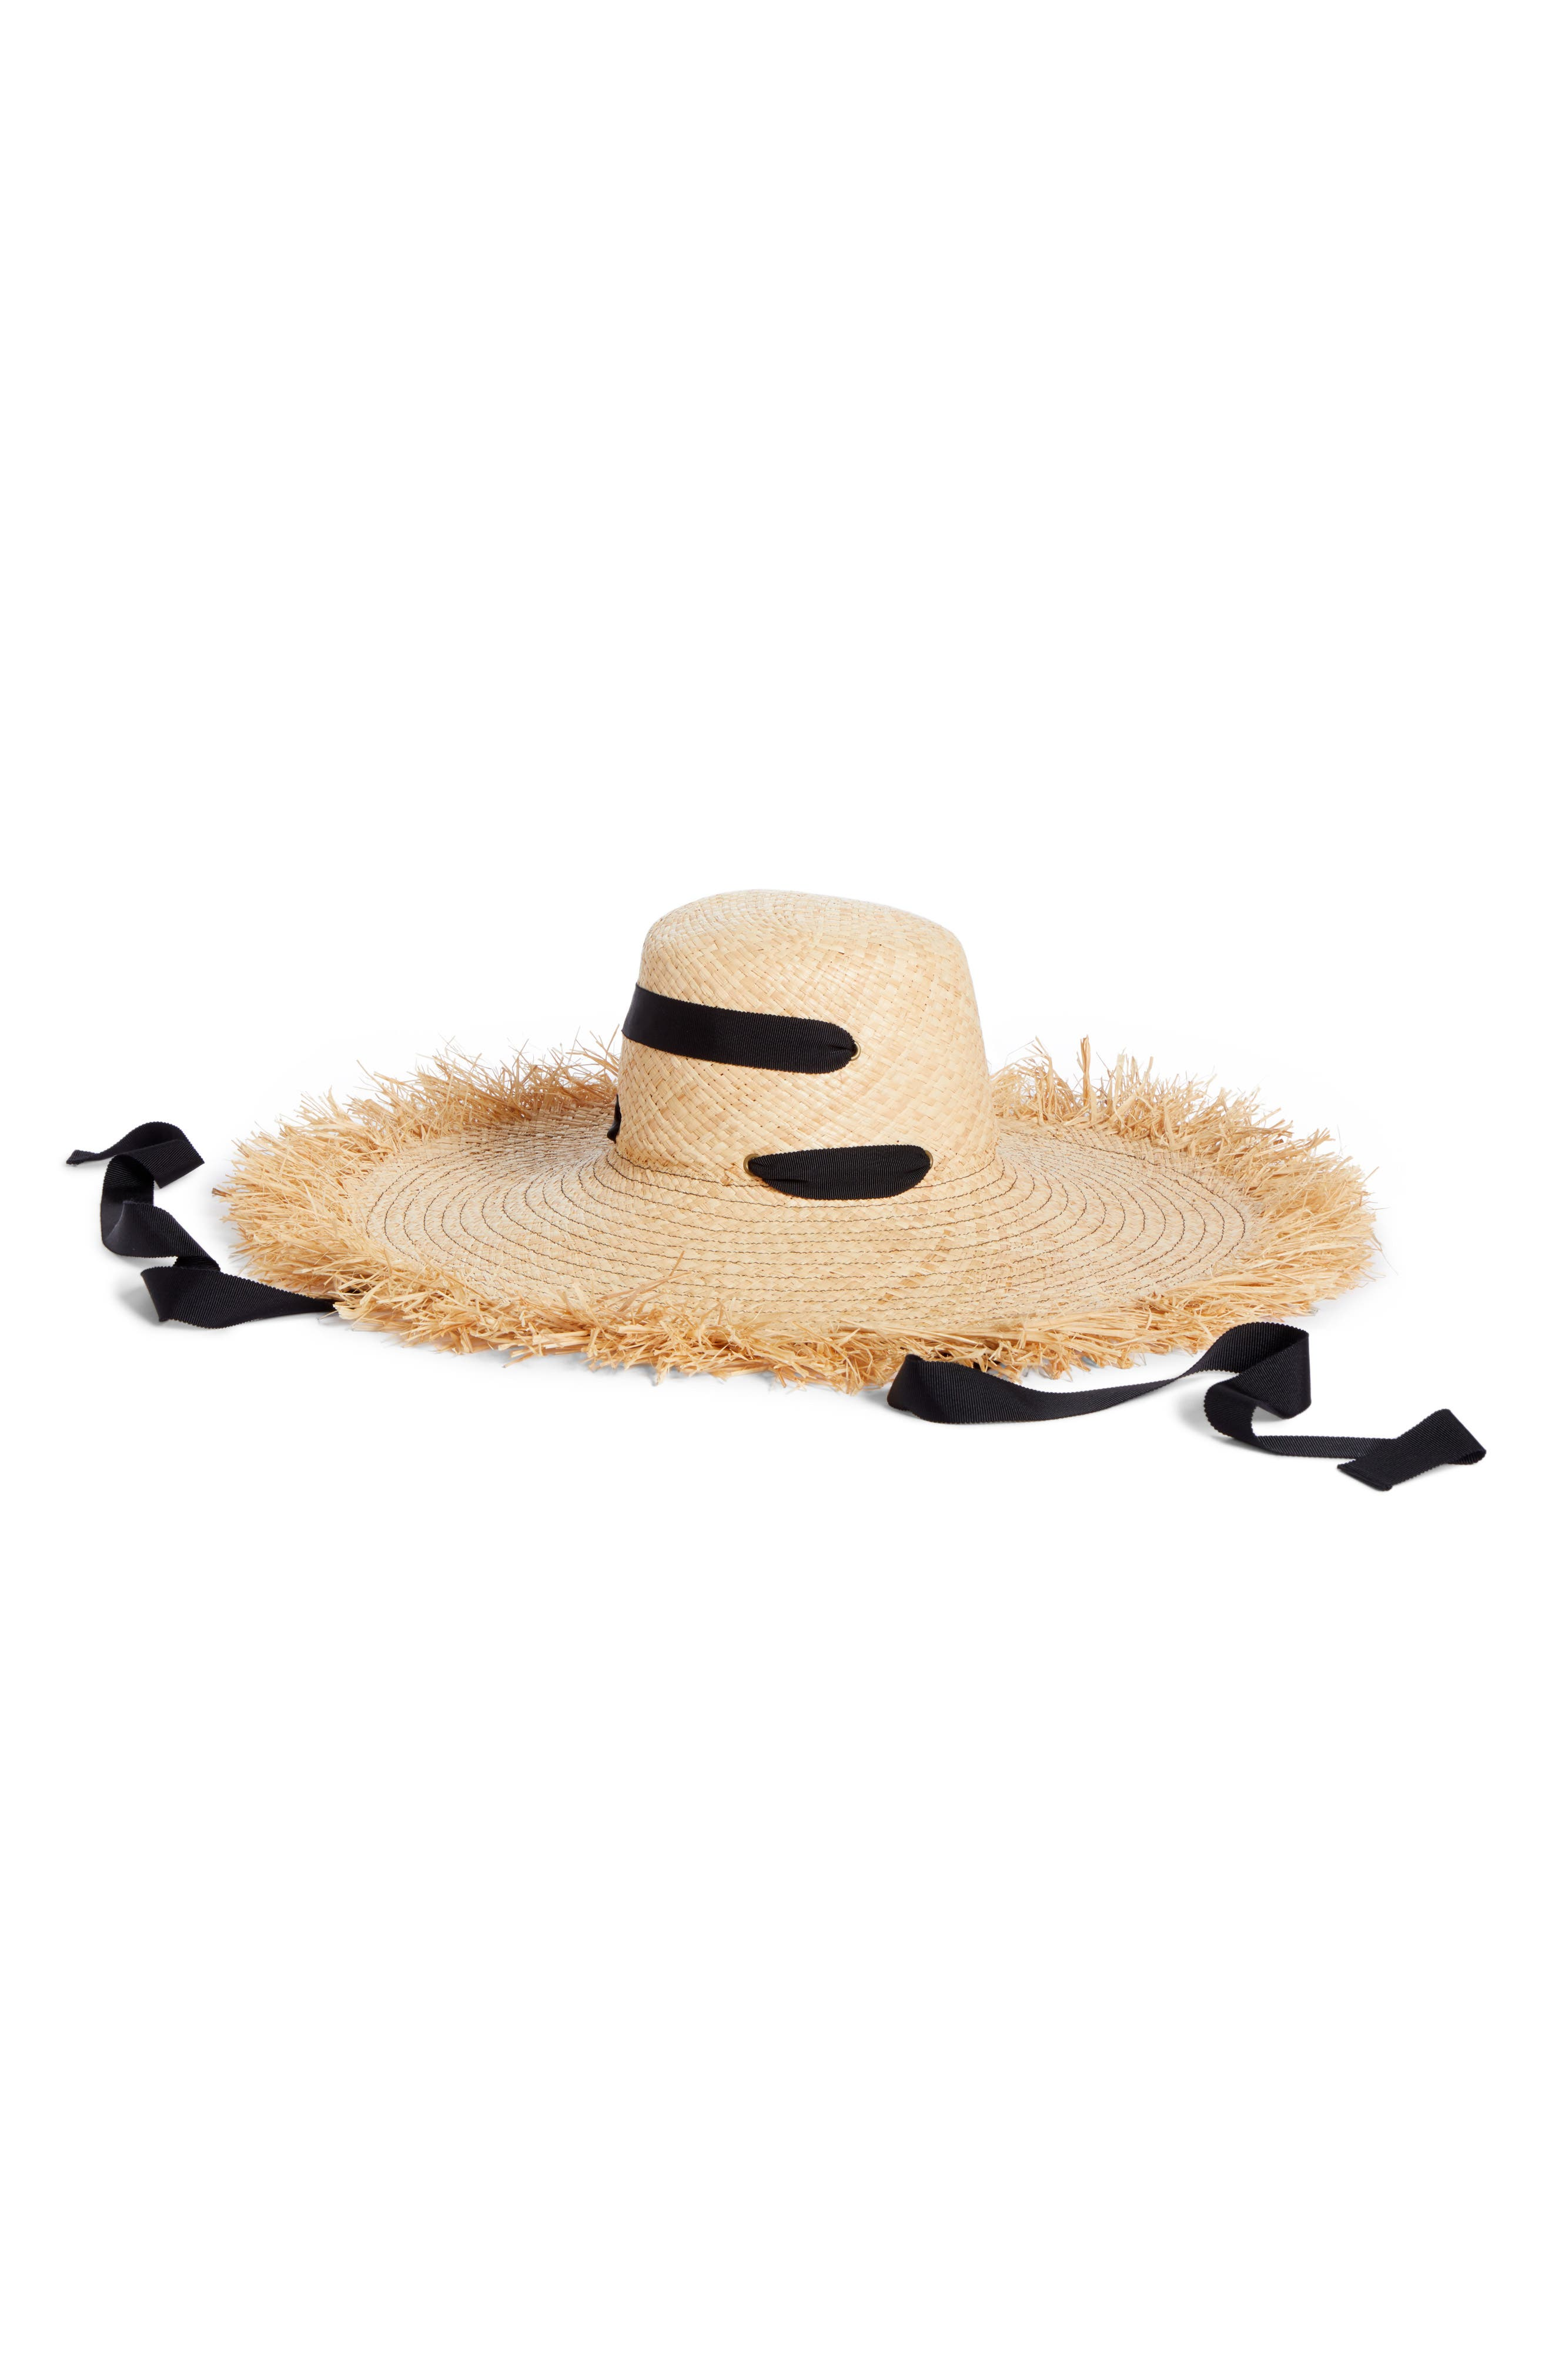 LOLA HATS Alpargatas Straw Hat, Main, color, NAT/ BLACK